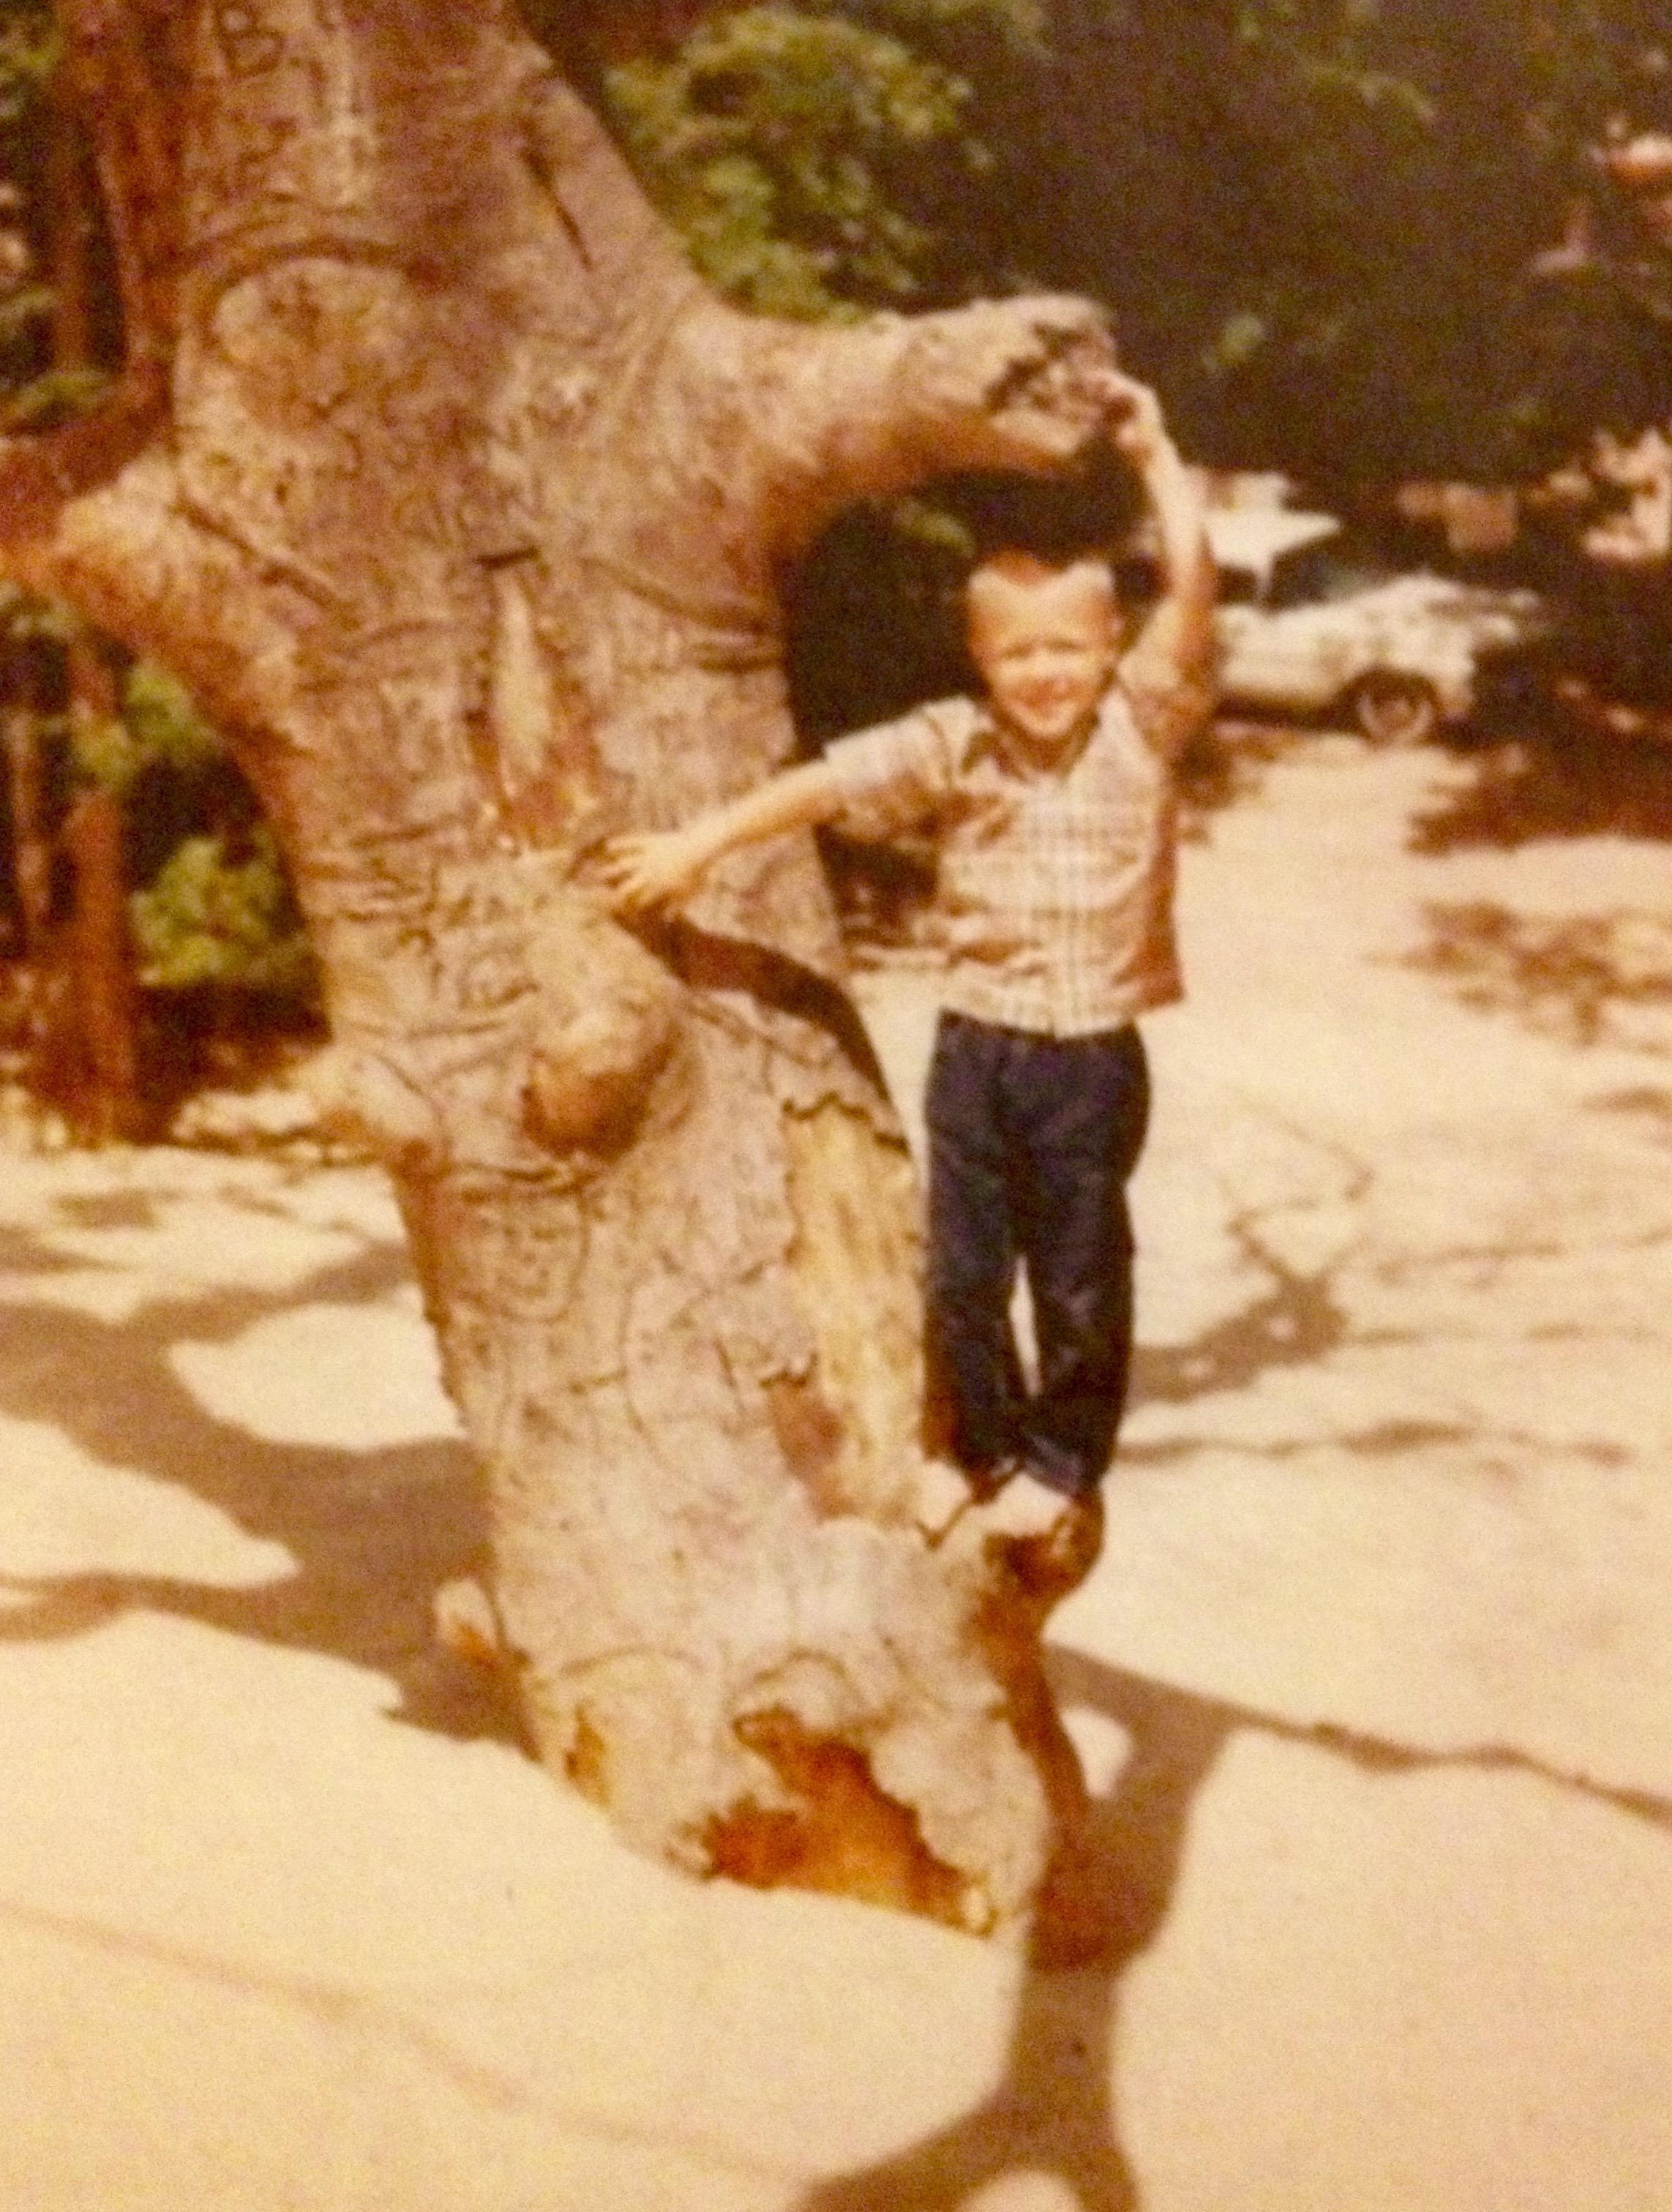 David Grimshaw age 4